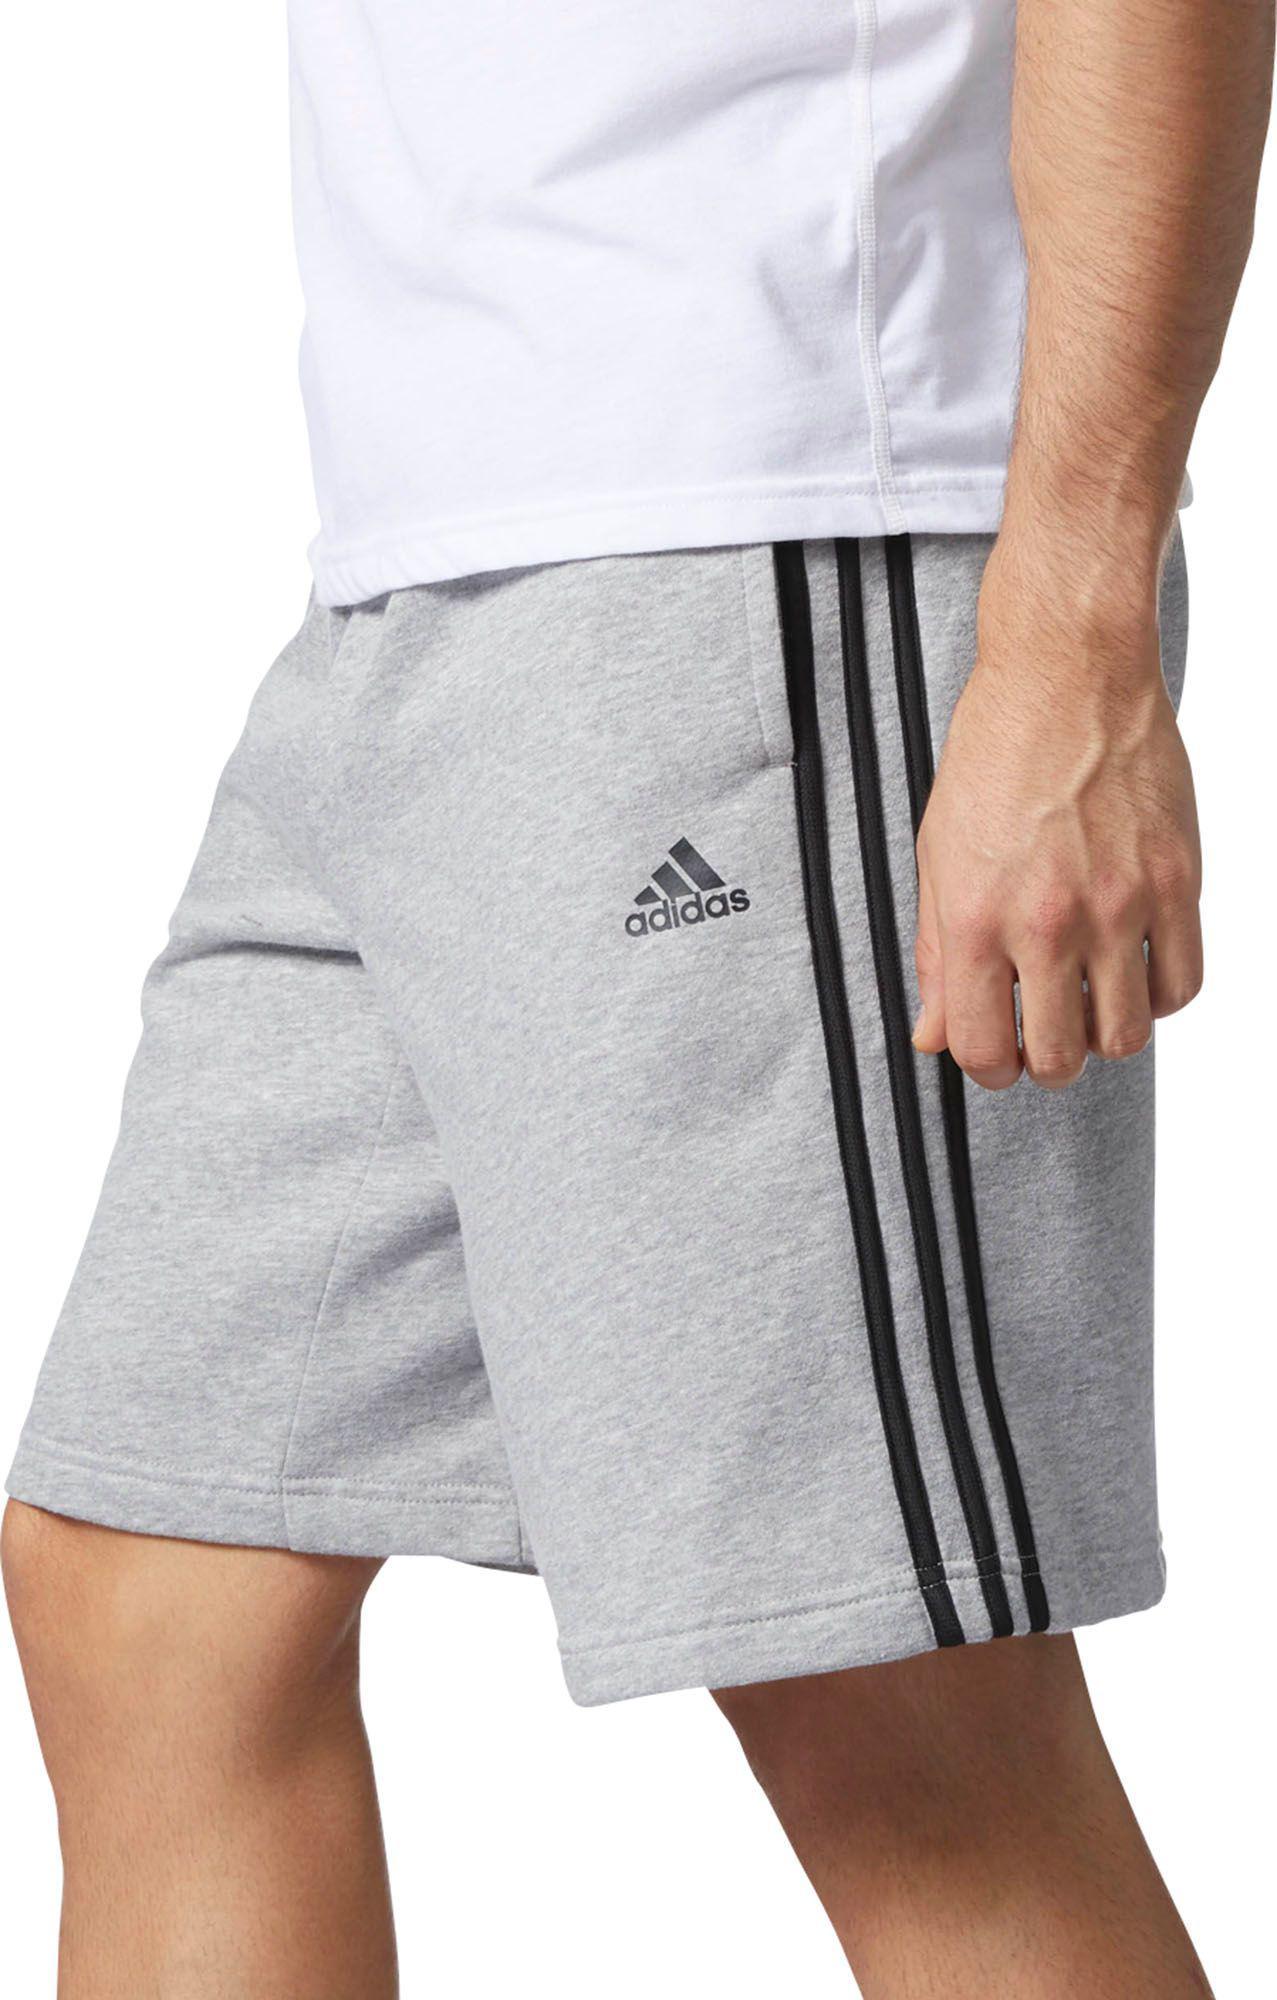 adidas essentials cotton shorts